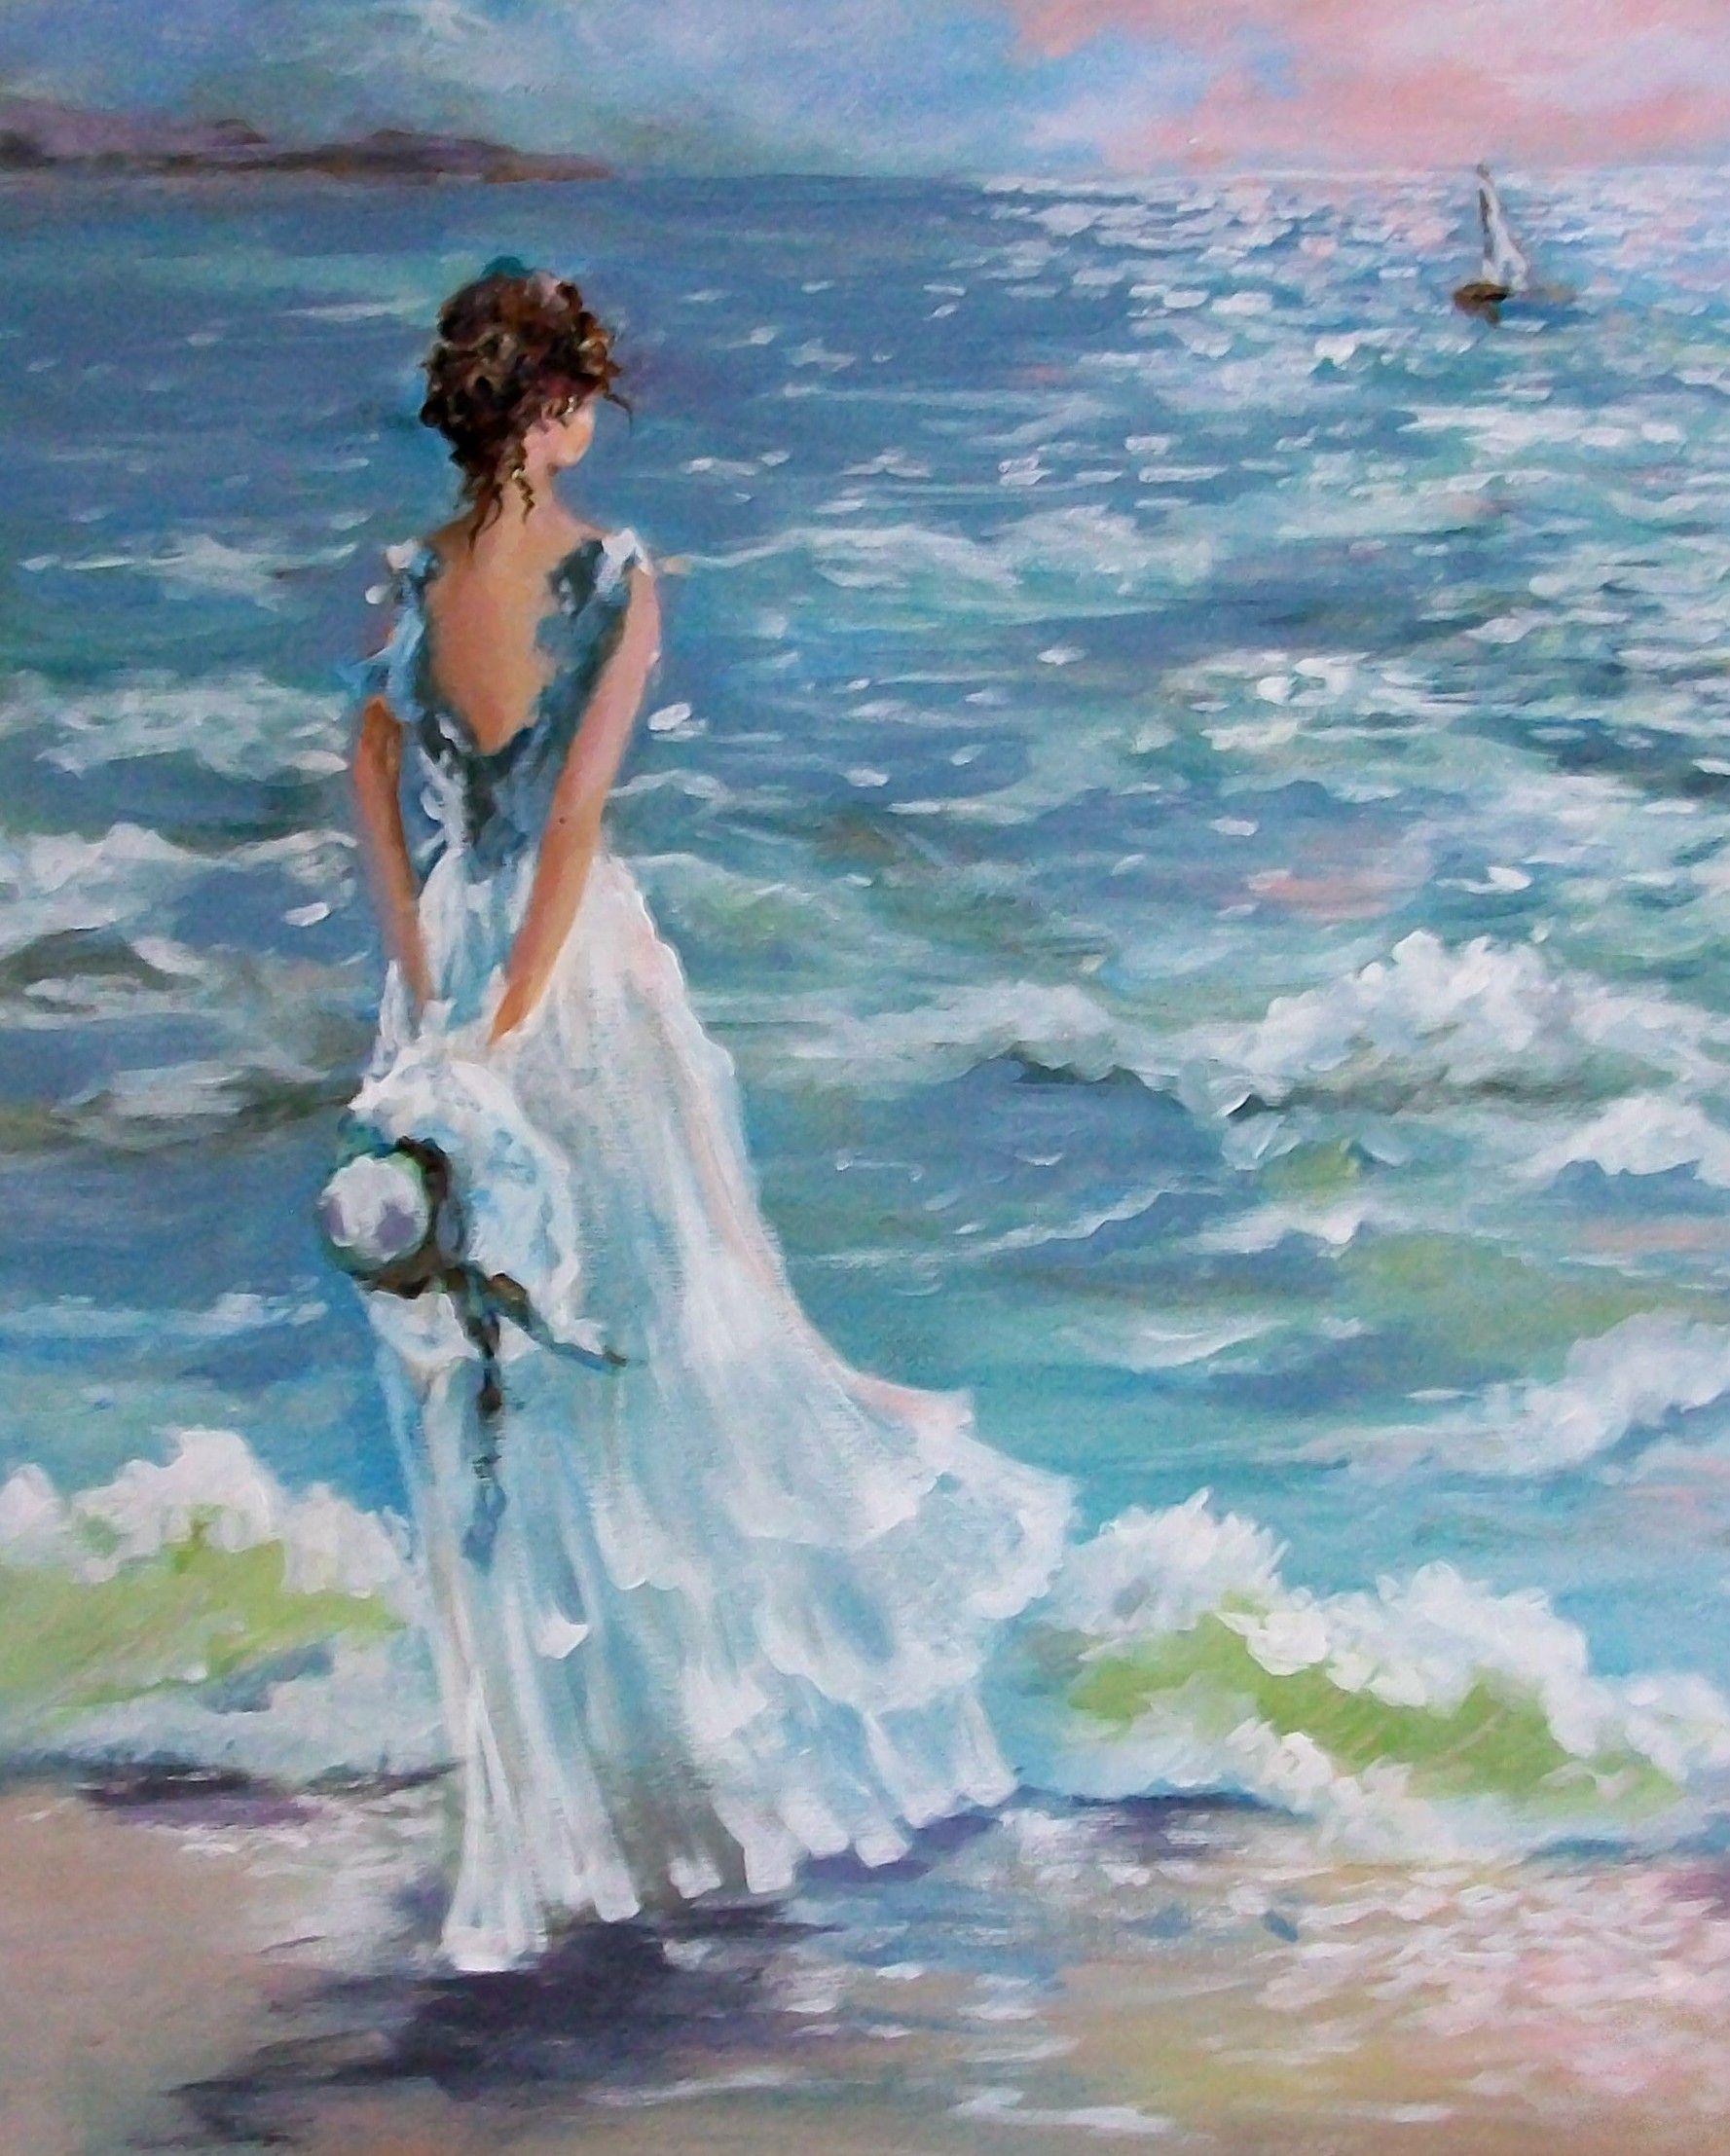 Painting By Jeanette Donaher Www Jeanetted41 Blogspot Com Sanat Fotoğrafçılığı Sanatsal Resimler Tuval Resimleri